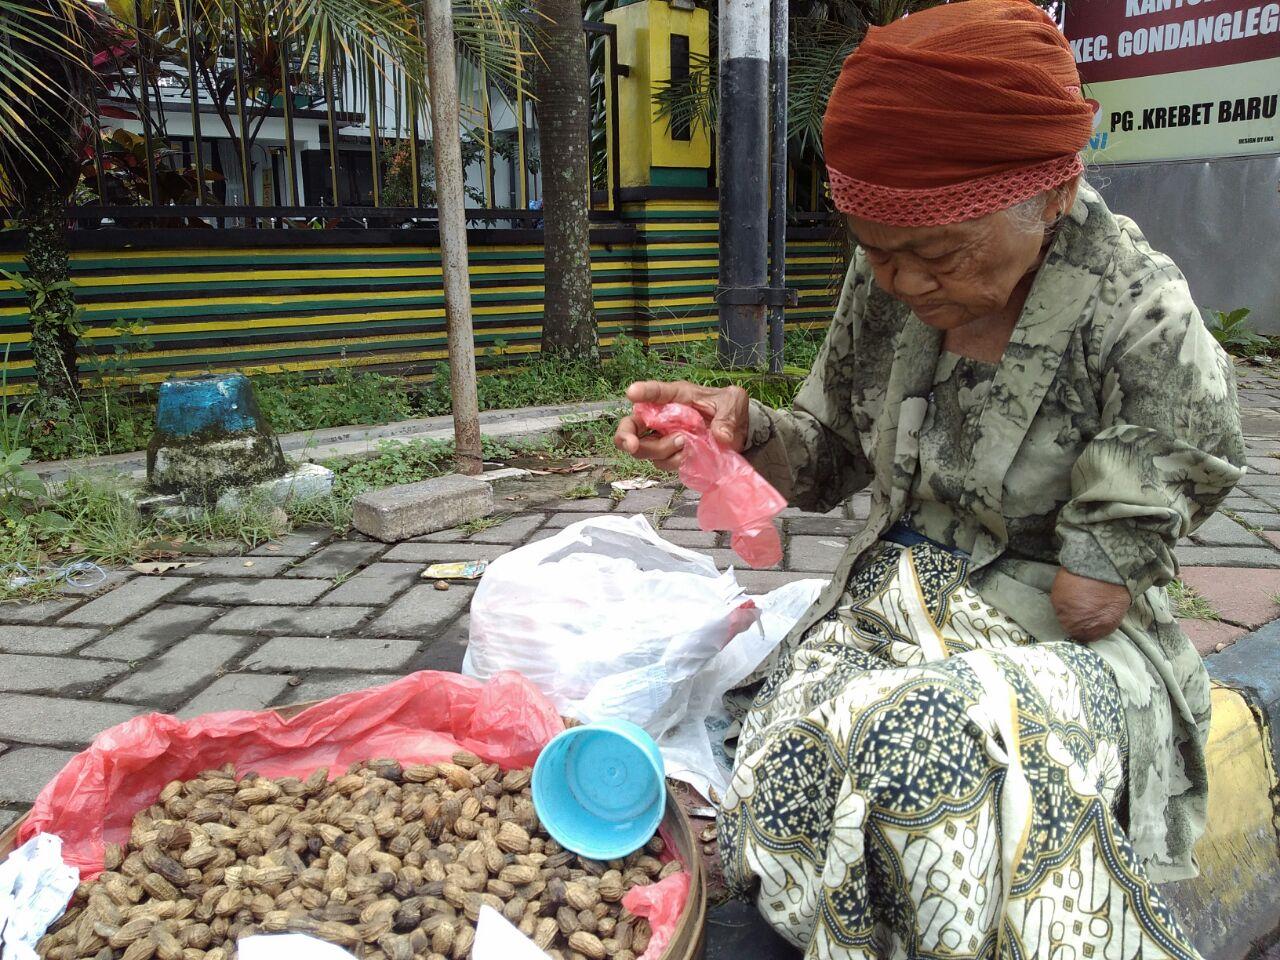 Mbah Saturi saat berjualan kacang di depan Kantor Kecamatan, Gondanglegi, Kabupaten Malang (foto Lazismu)